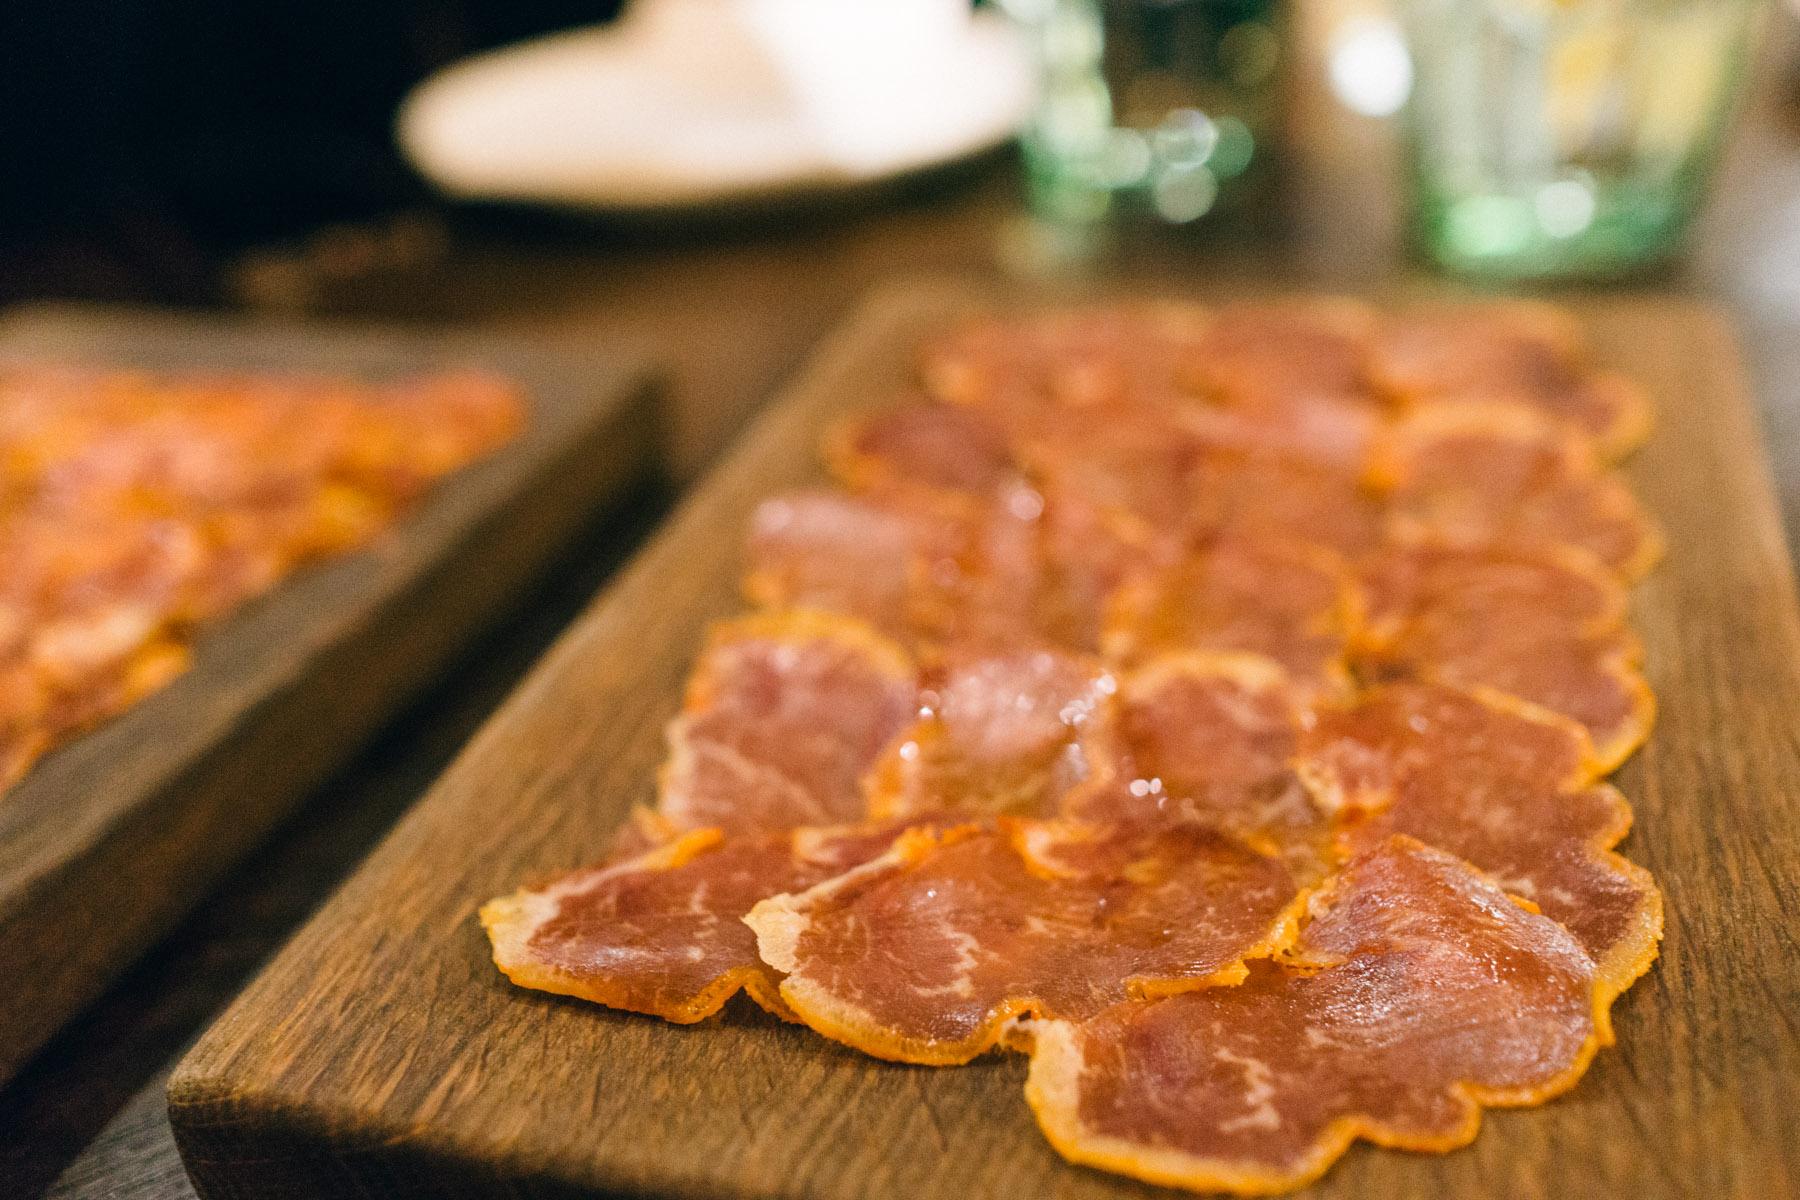 ham-and-sherry-spanish-tapas-ship-street-wan-chai-hong-kong-jason-atherton-4